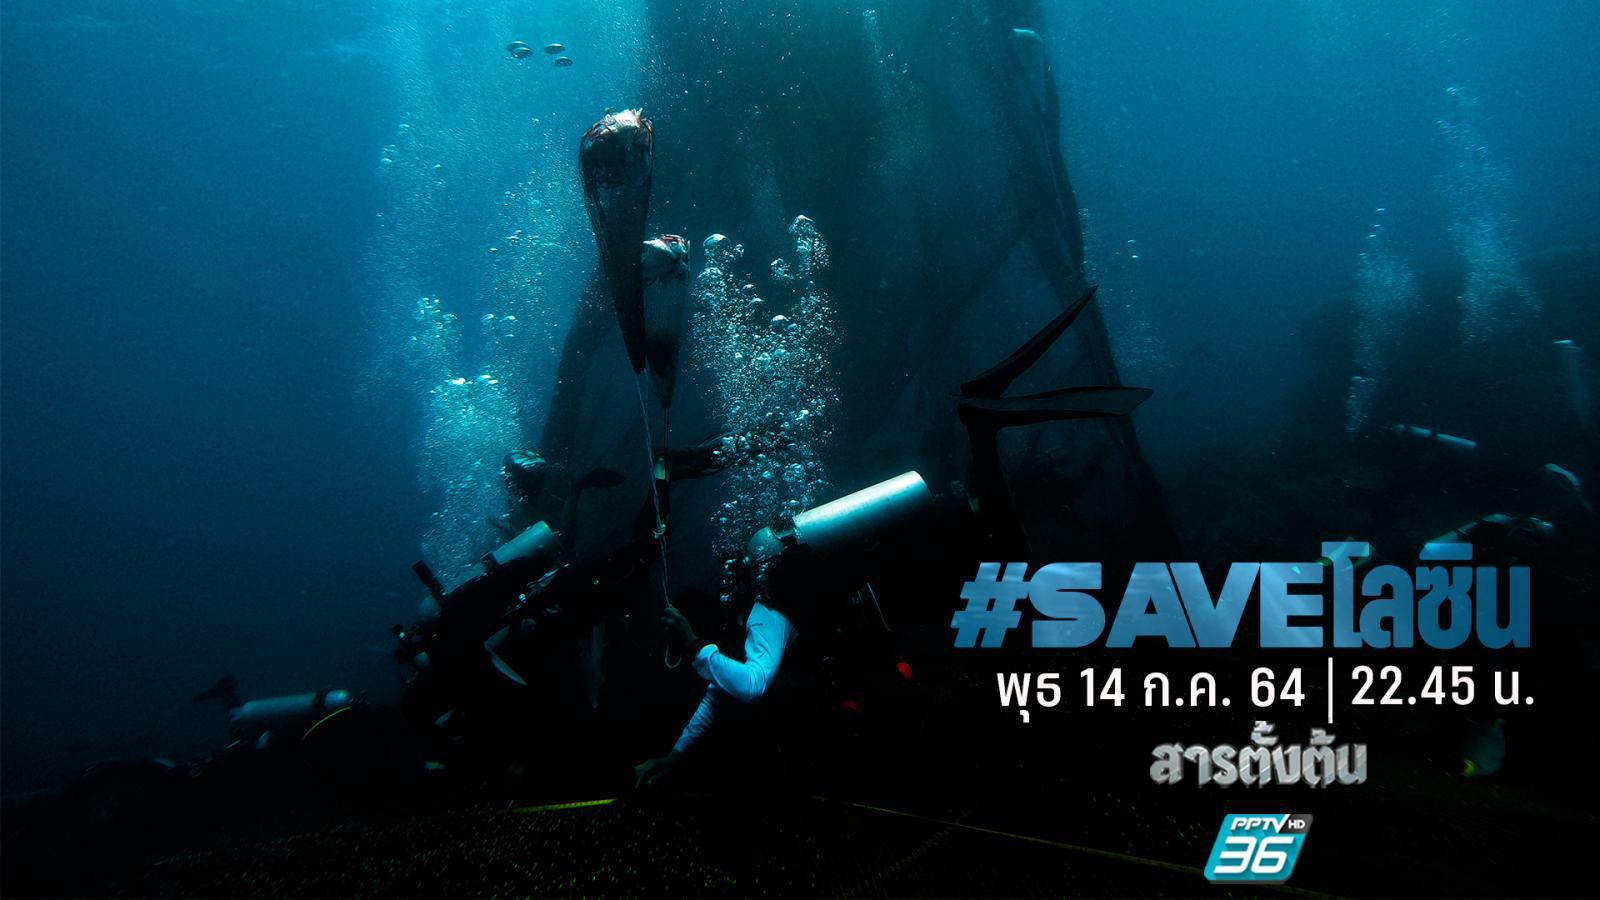 #saveโลซิน